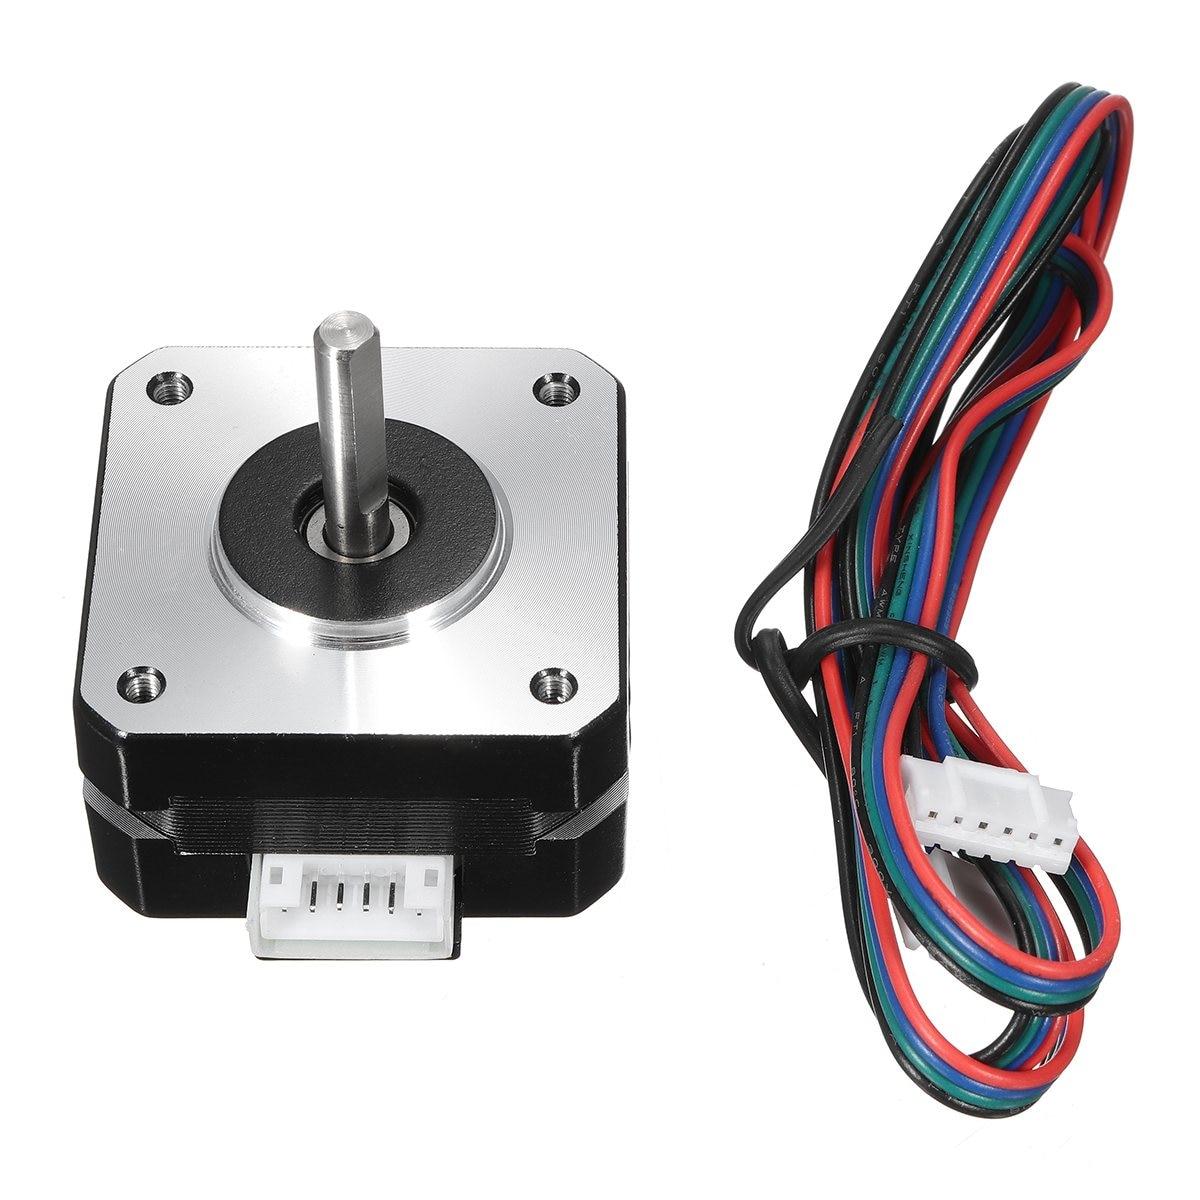 1Pcs Universal 3D Printer Step Motor Extruder Stepper Motor 17HD2408 17 Stepper Motor